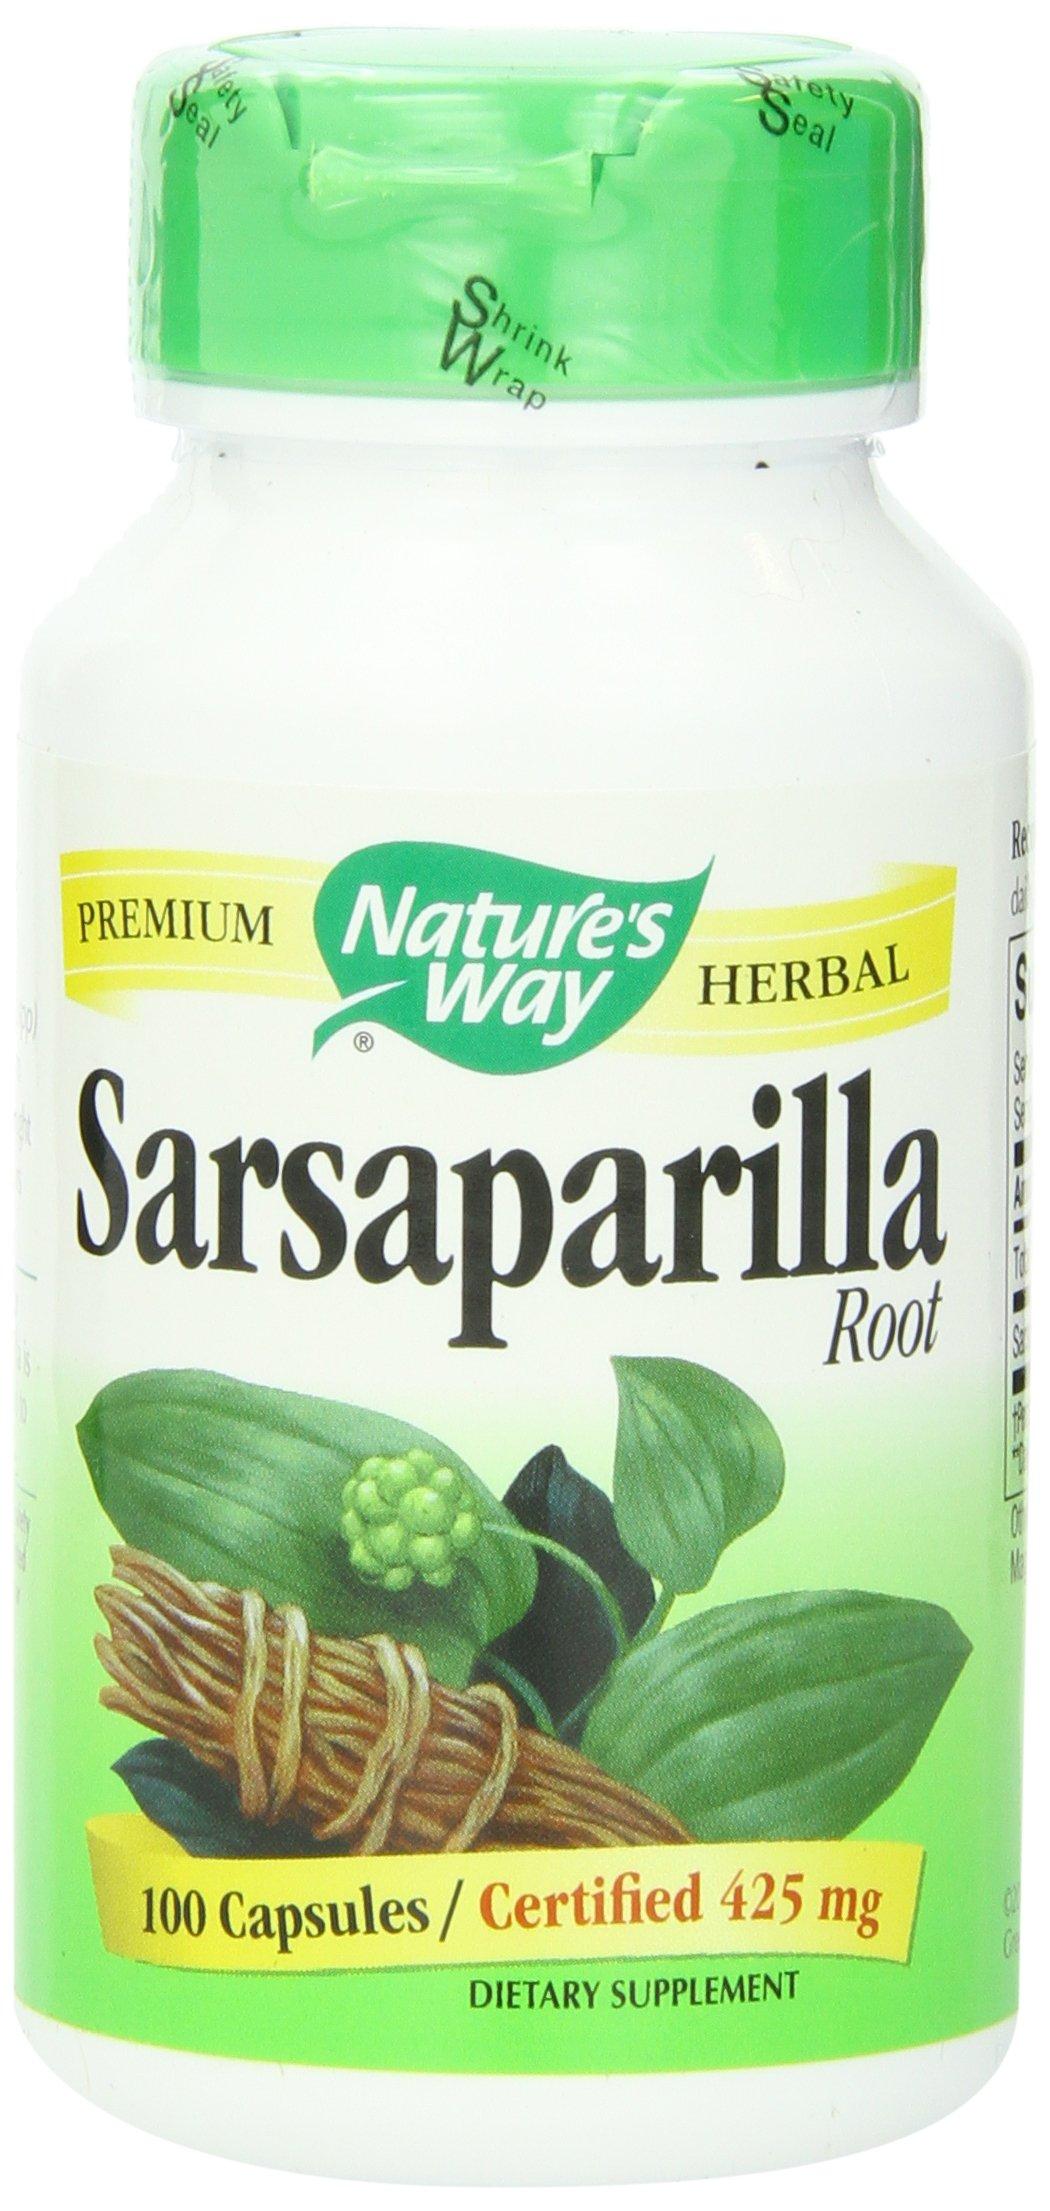 Nature's Way Sarsaparilla Root Capsules 425 mg, 100-Count